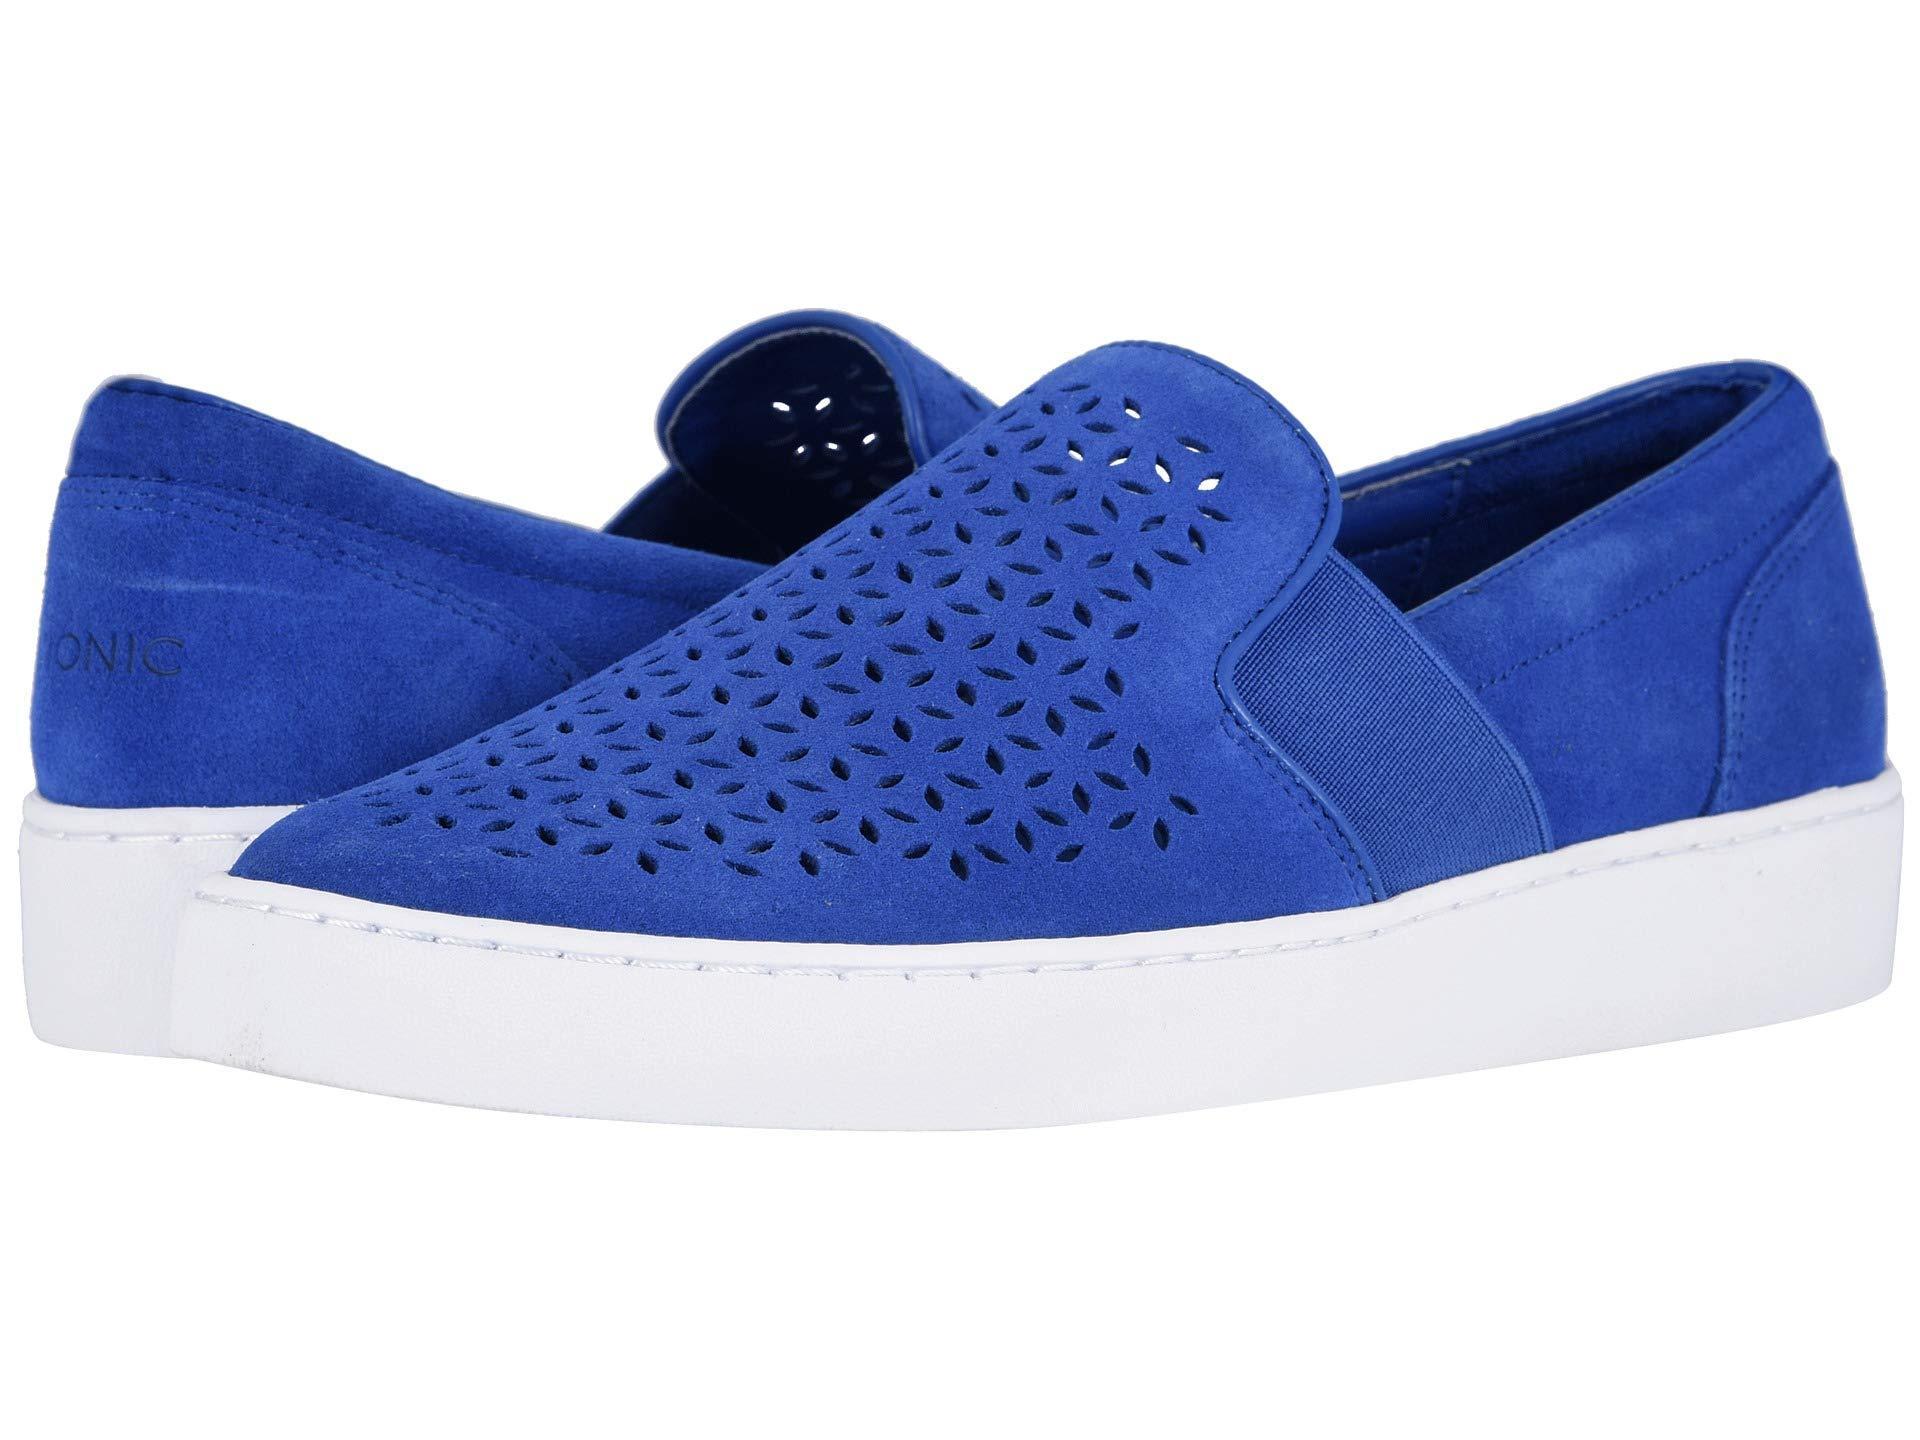 7314eb27a19 Lyst - Vionic Kani (black) Women s Slip On Shoes in Blue